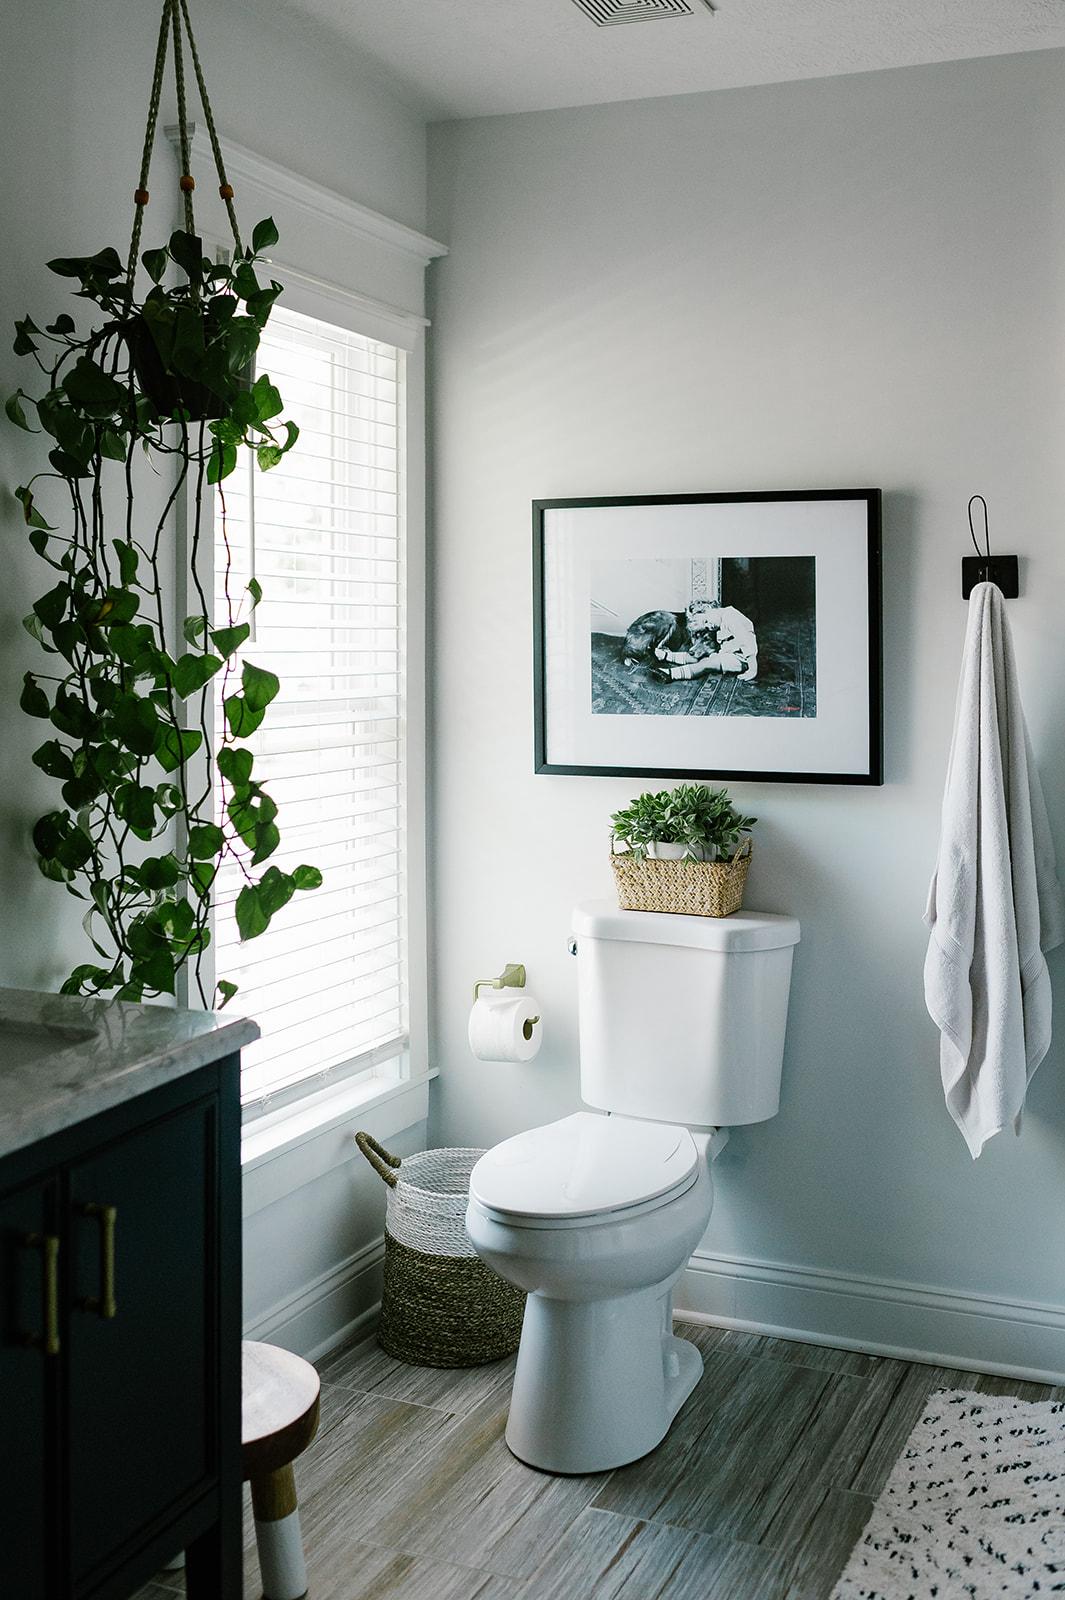 Our Bright & Boho Owner's Bathroom | Miranda Schroeder Blog  www.mirandaschroeder.com  White bathroom, navy blue double vanity with brass hardware, bathroom rug, Persian, wooden stool, storage, main bath, owner's bath